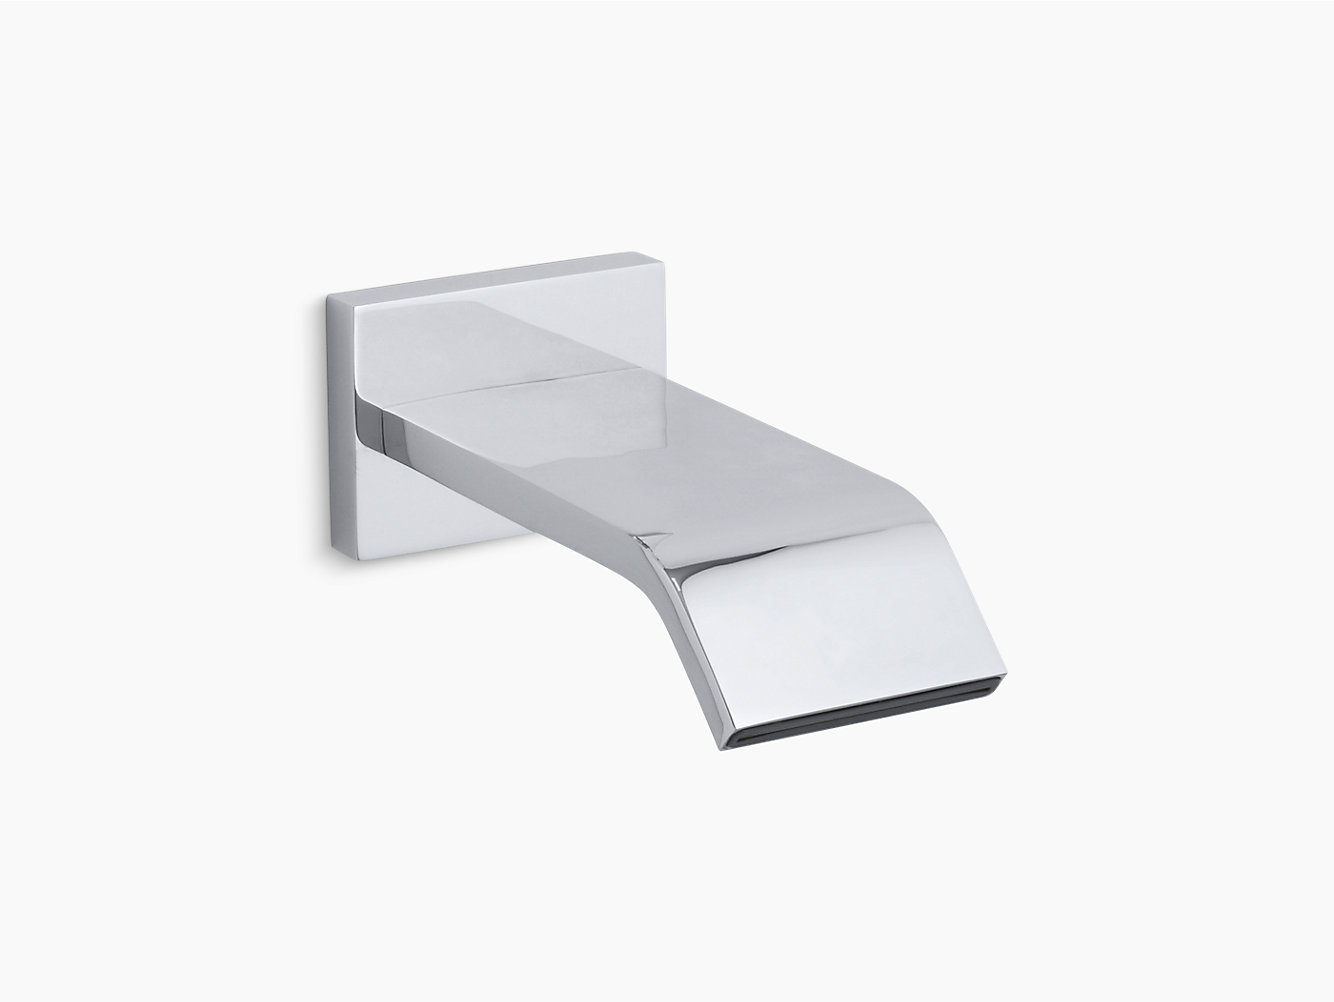 Loure Wall-Mount 9-3/4-Inch Non-Diverter Bath Spout | K-14676 | KOHLER